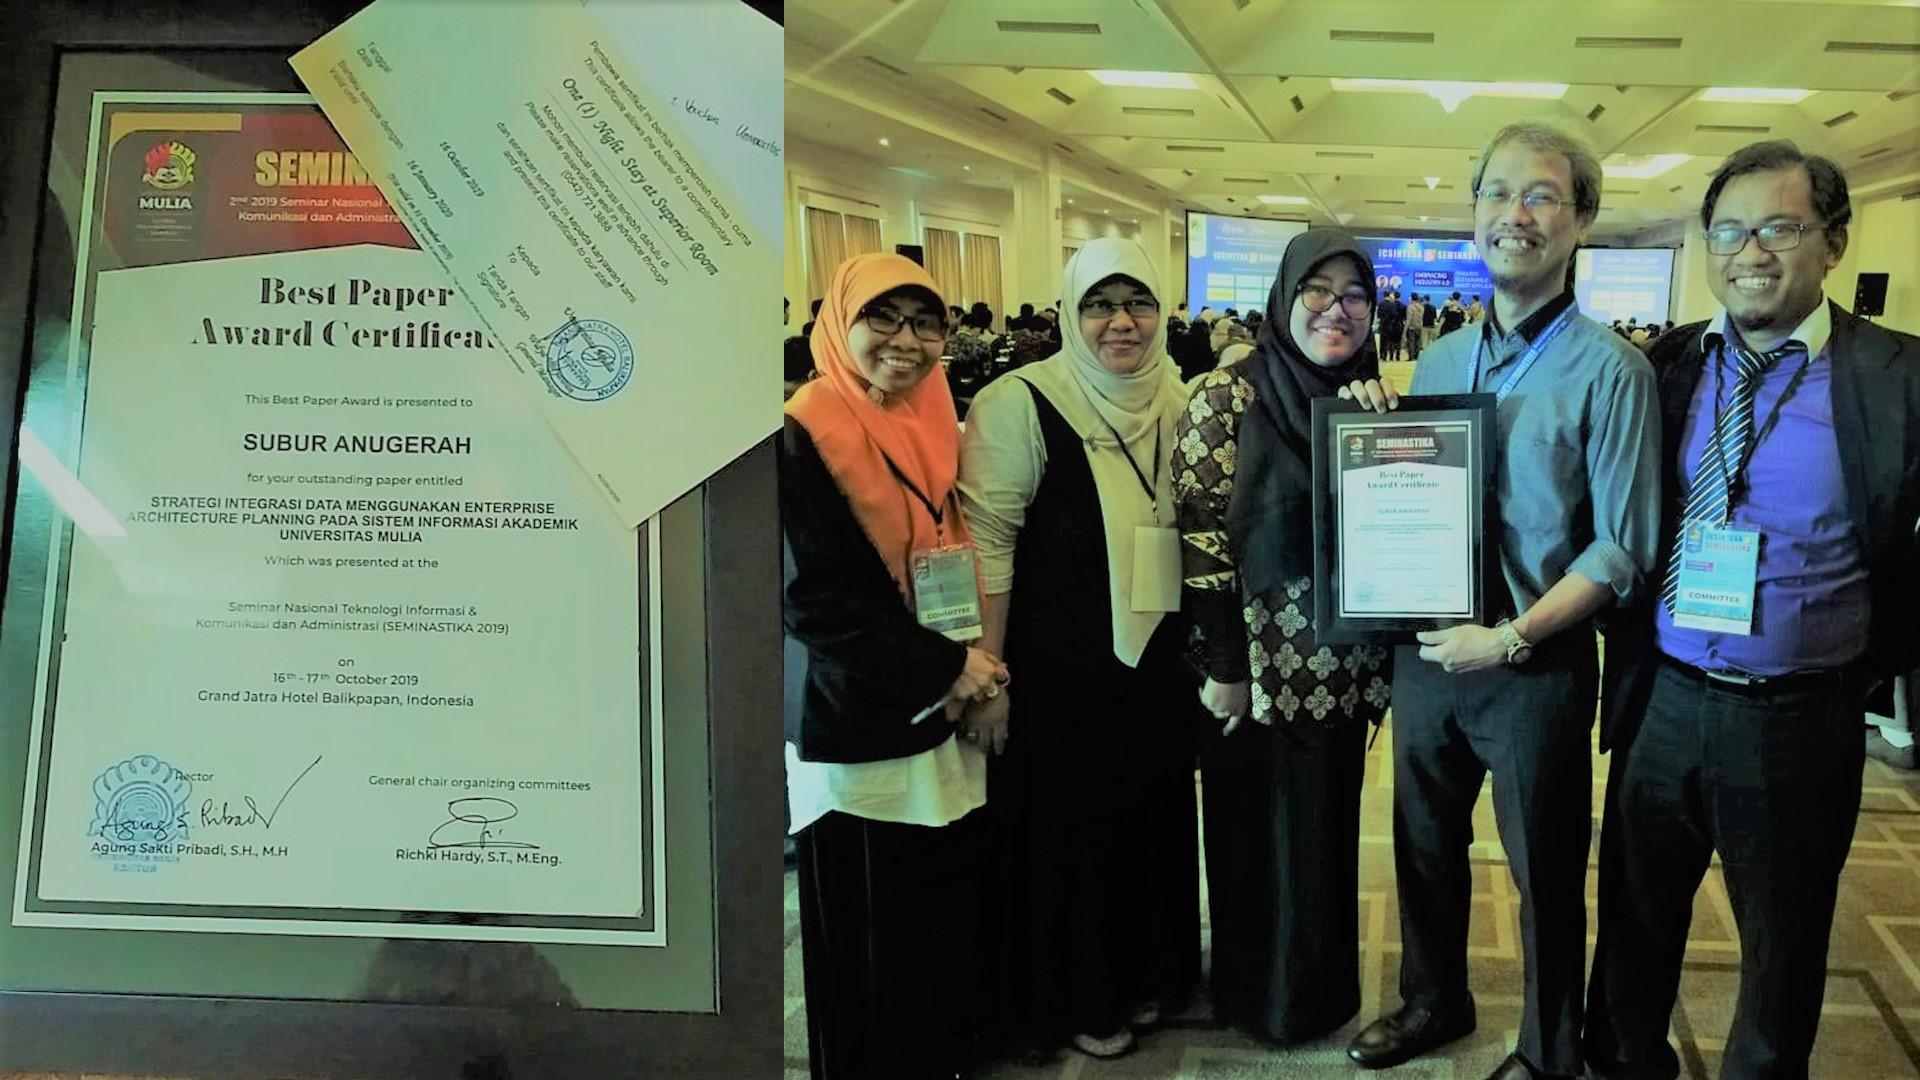 Mendapat sertifikat dan tiket menginap sehari semalam di Hotel Grand Jatra. Foto: Istimewa.